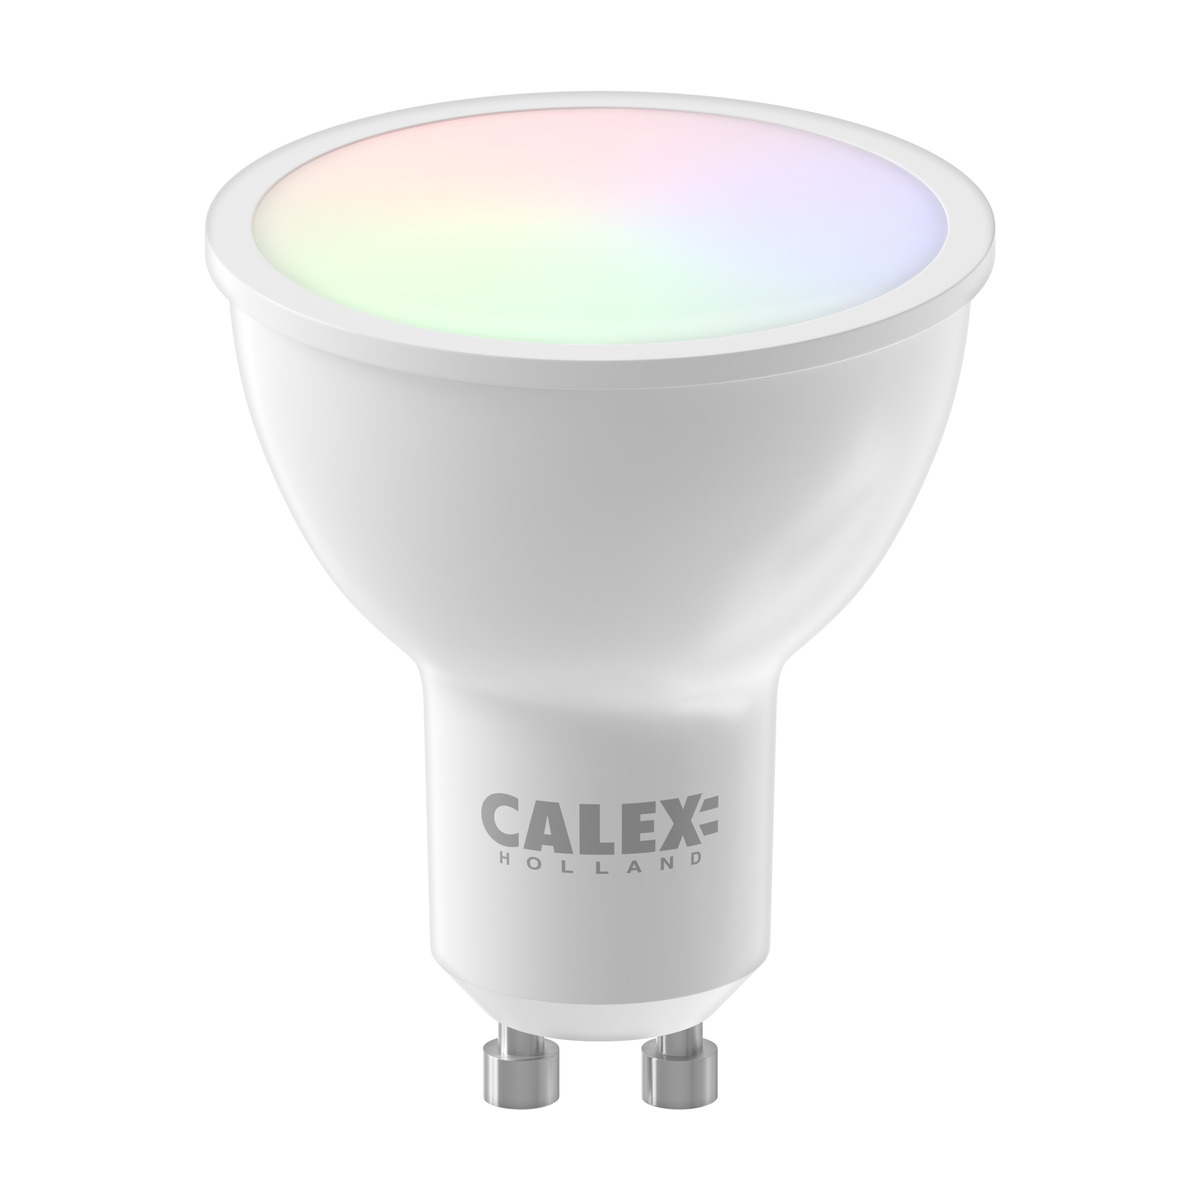 Calex 429002 Reflector 350lm